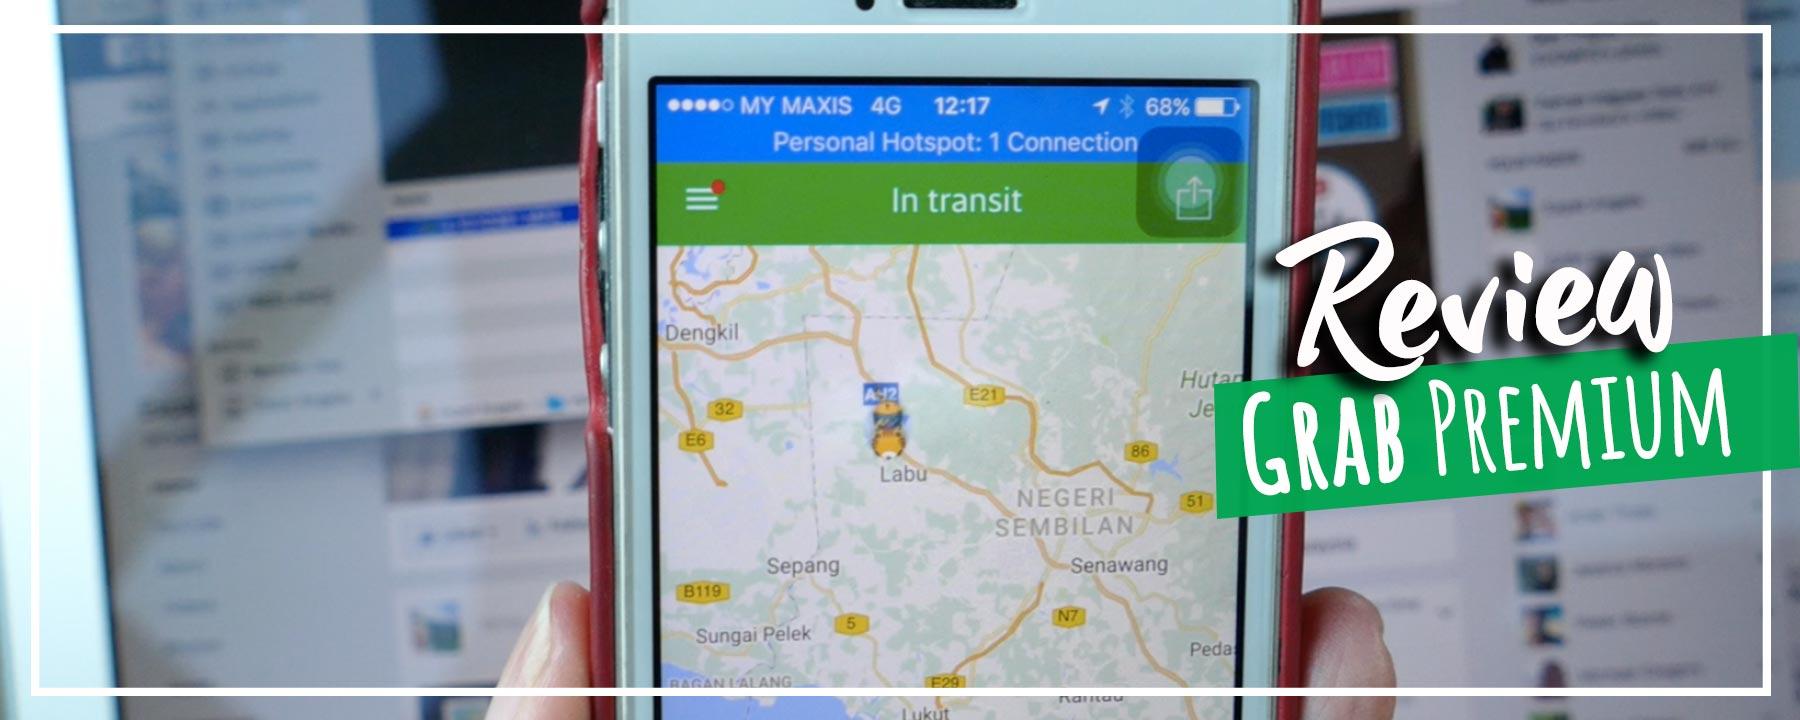 Grab Premium Kuala Lumpur to Port Dickson in BMW for RM210